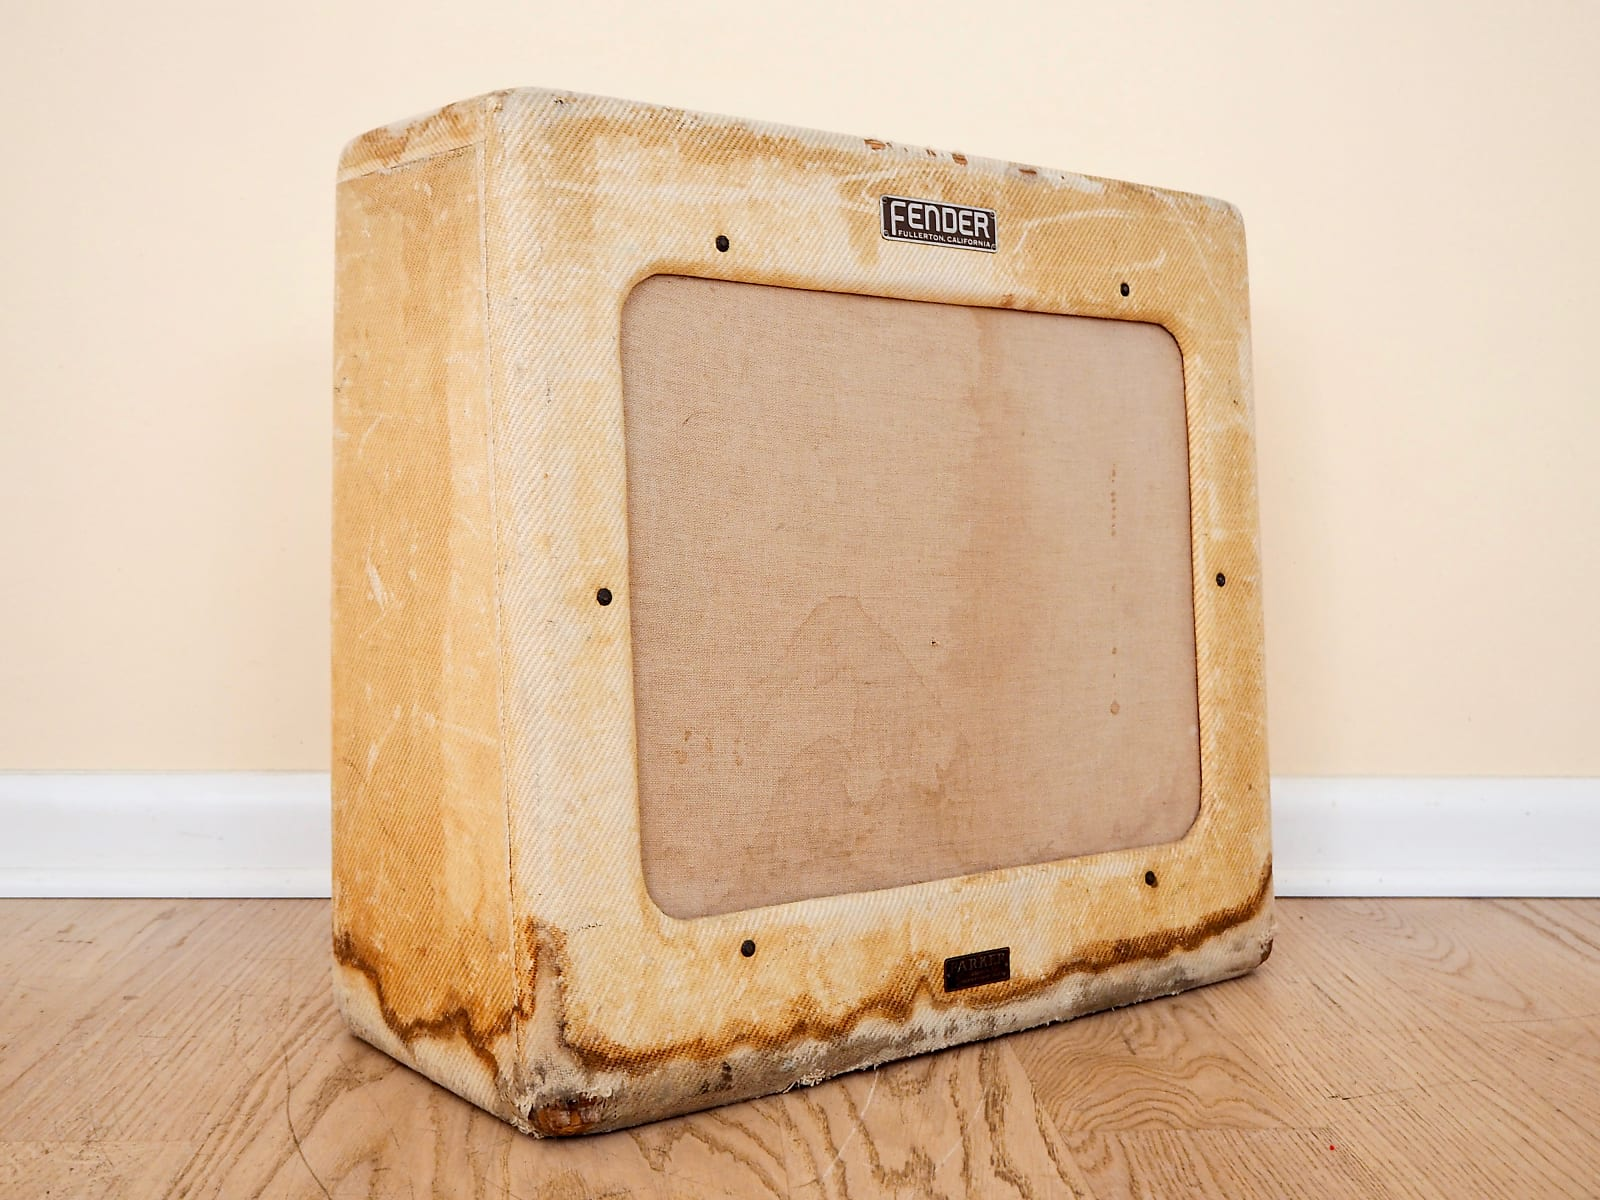 1950 Fender Pro TV Front Tweed Vintage Tube Guitar Amplifier 1x15, w/ RCA 6L6GC